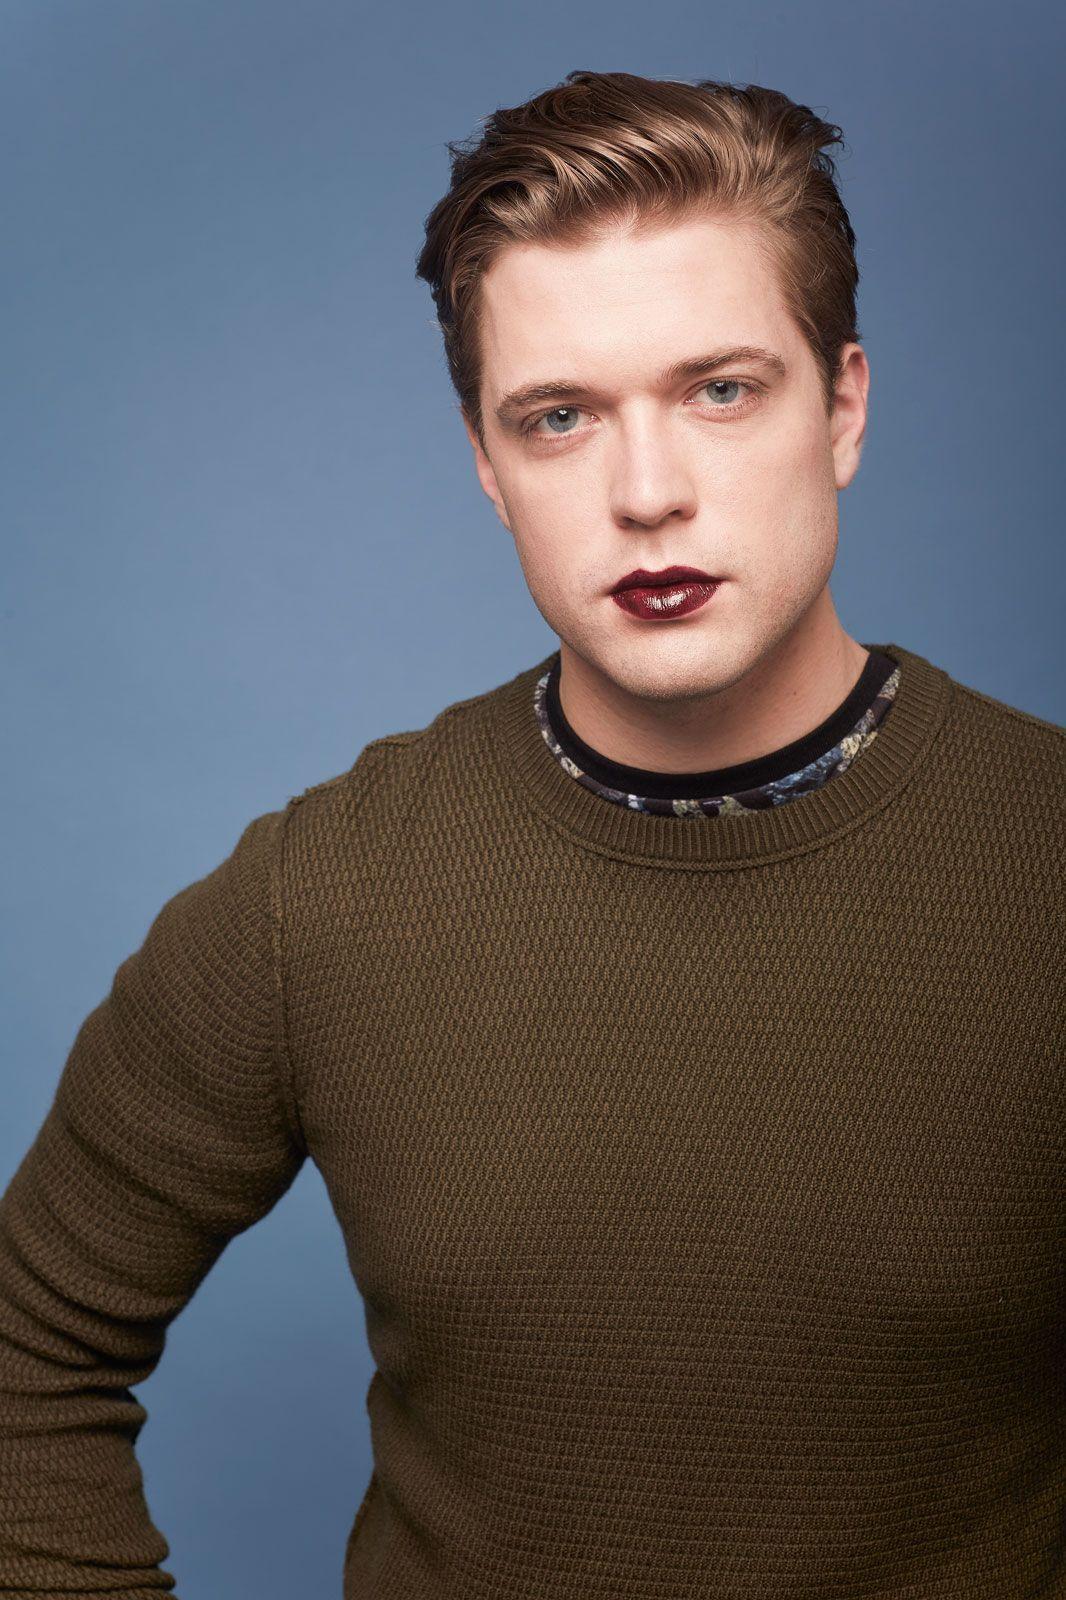 Boys In Lipstick, Just Because   Men wearing makeup, Wear